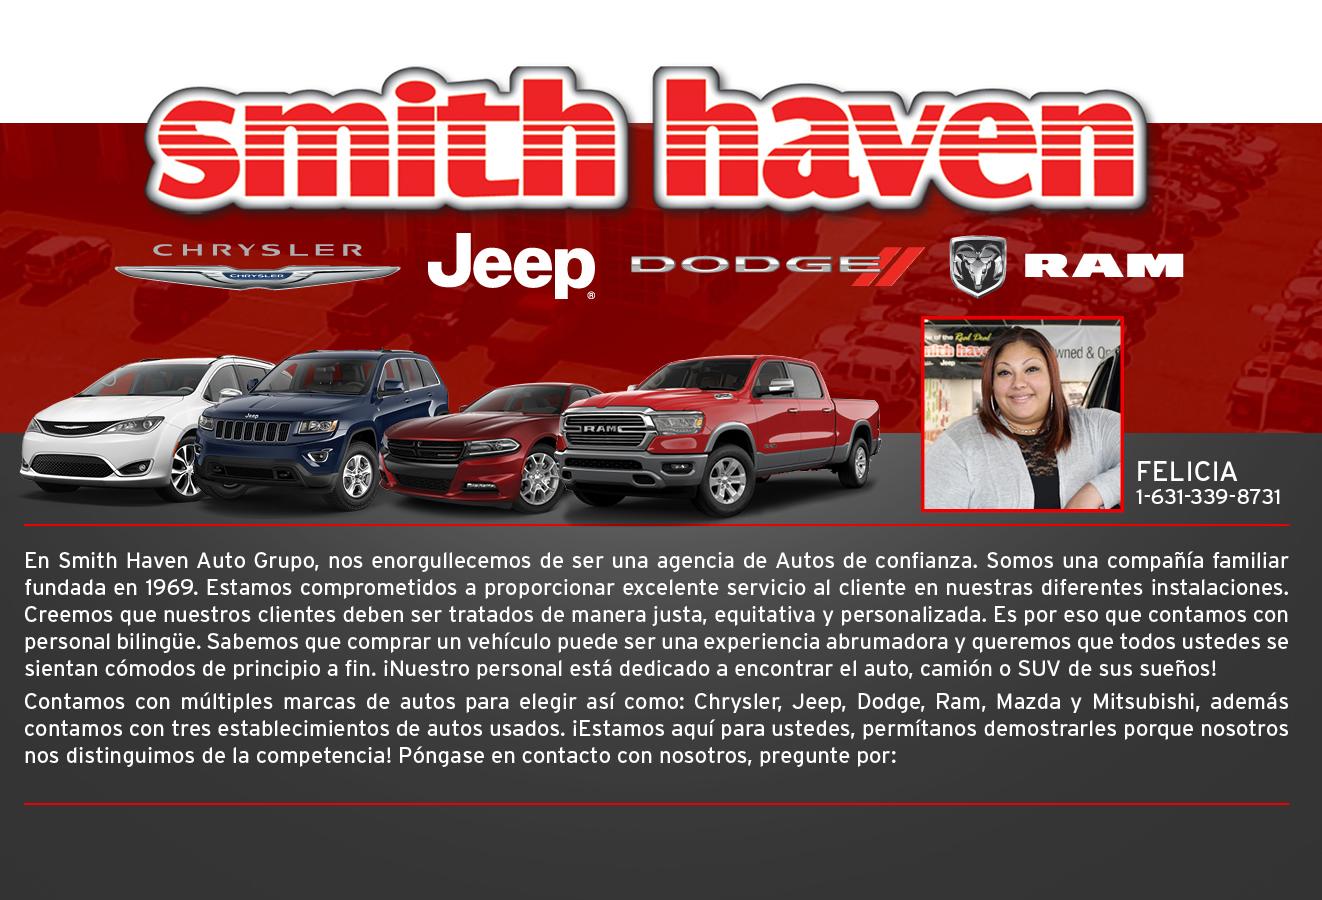 smith haven chrysler jeep dodge ram espa ol llama a felicia 631 339 8731 smith haven. Black Bedroom Furniture Sets. Home Design Ideas